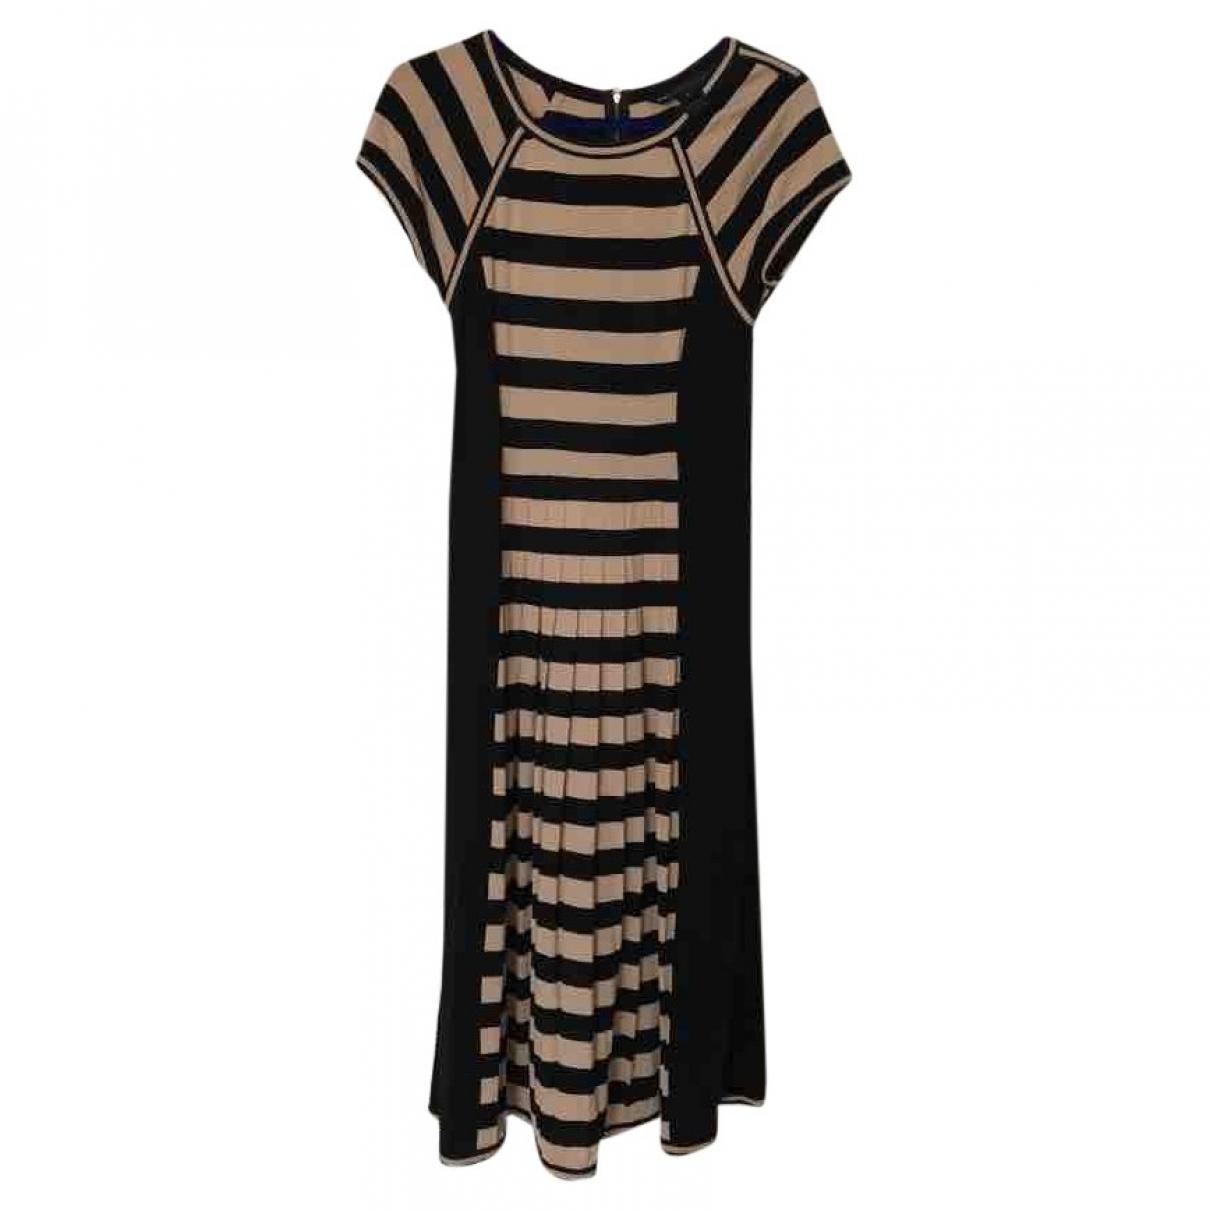 Marc By Marc Jacobs \N Wool dress for Women S International